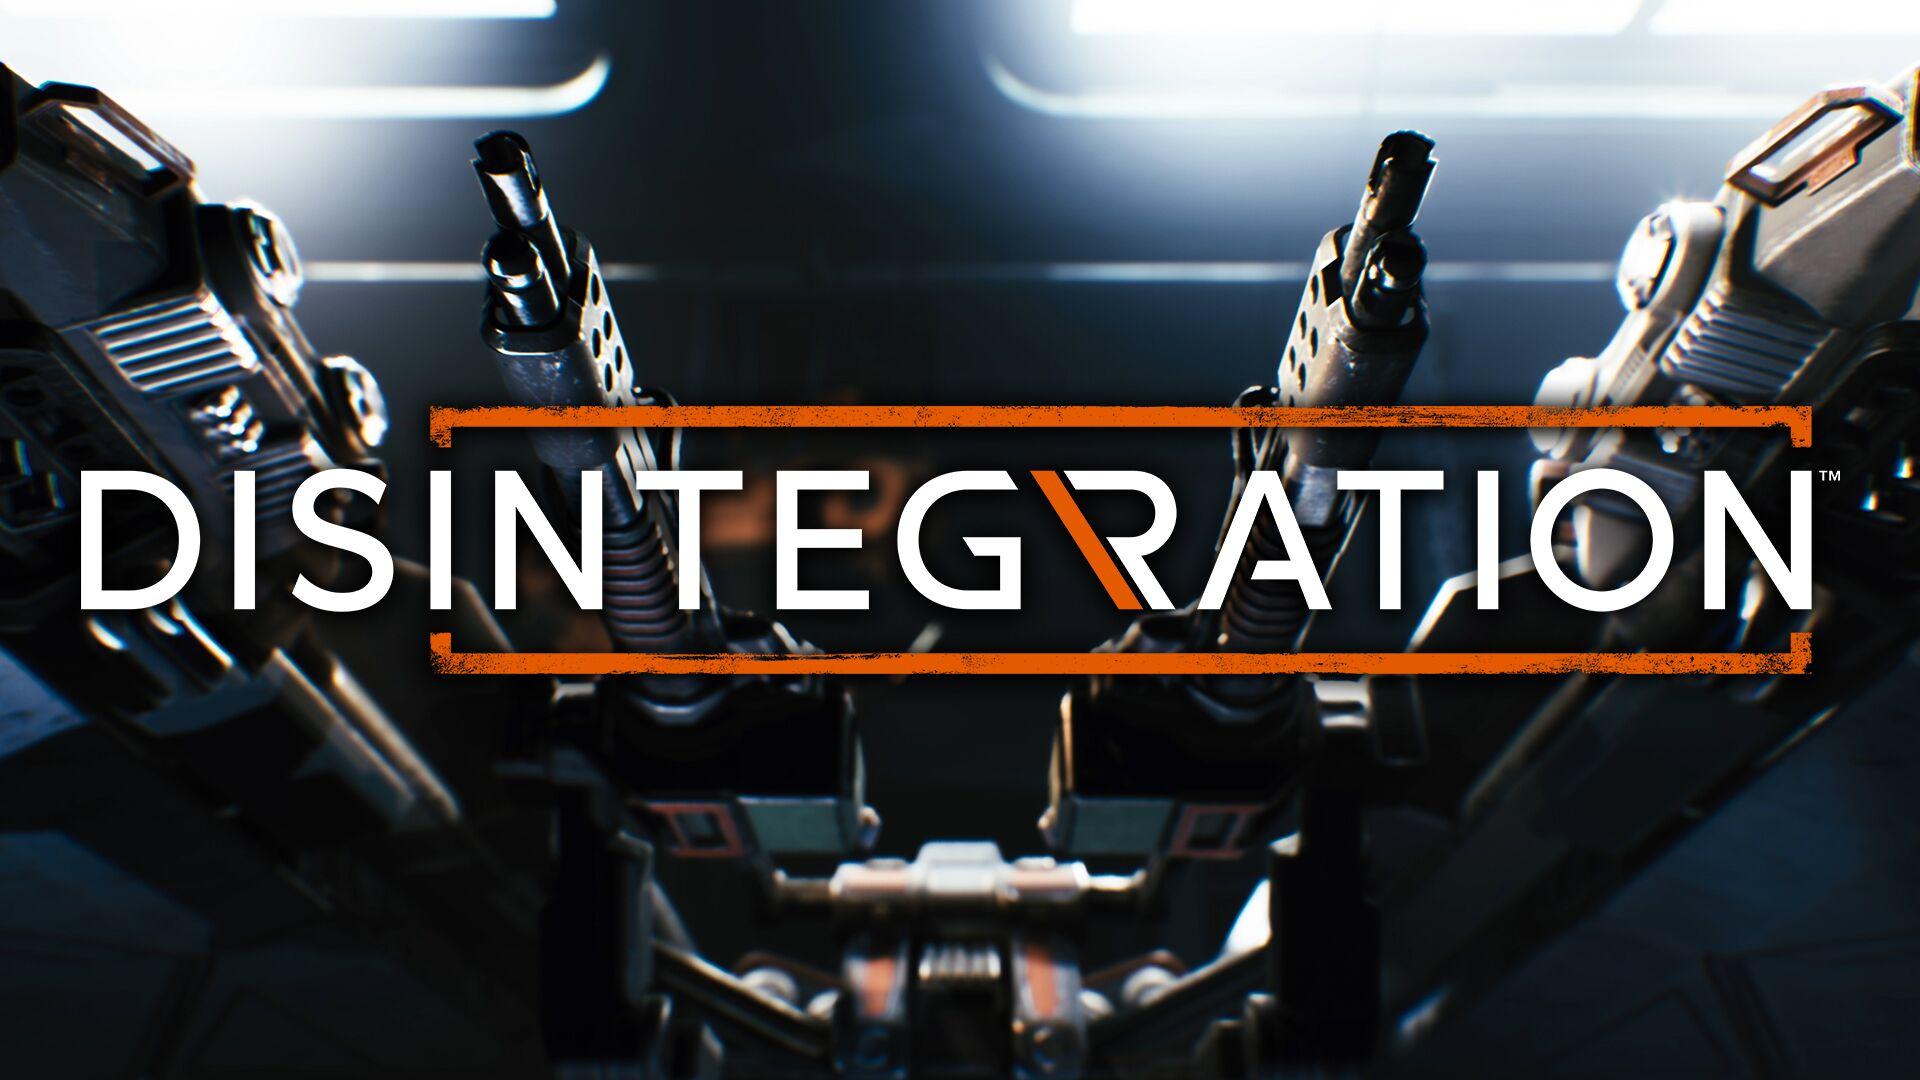 Halo co-creator Marcus Lehto reveals new shooter Disintegration - VG247